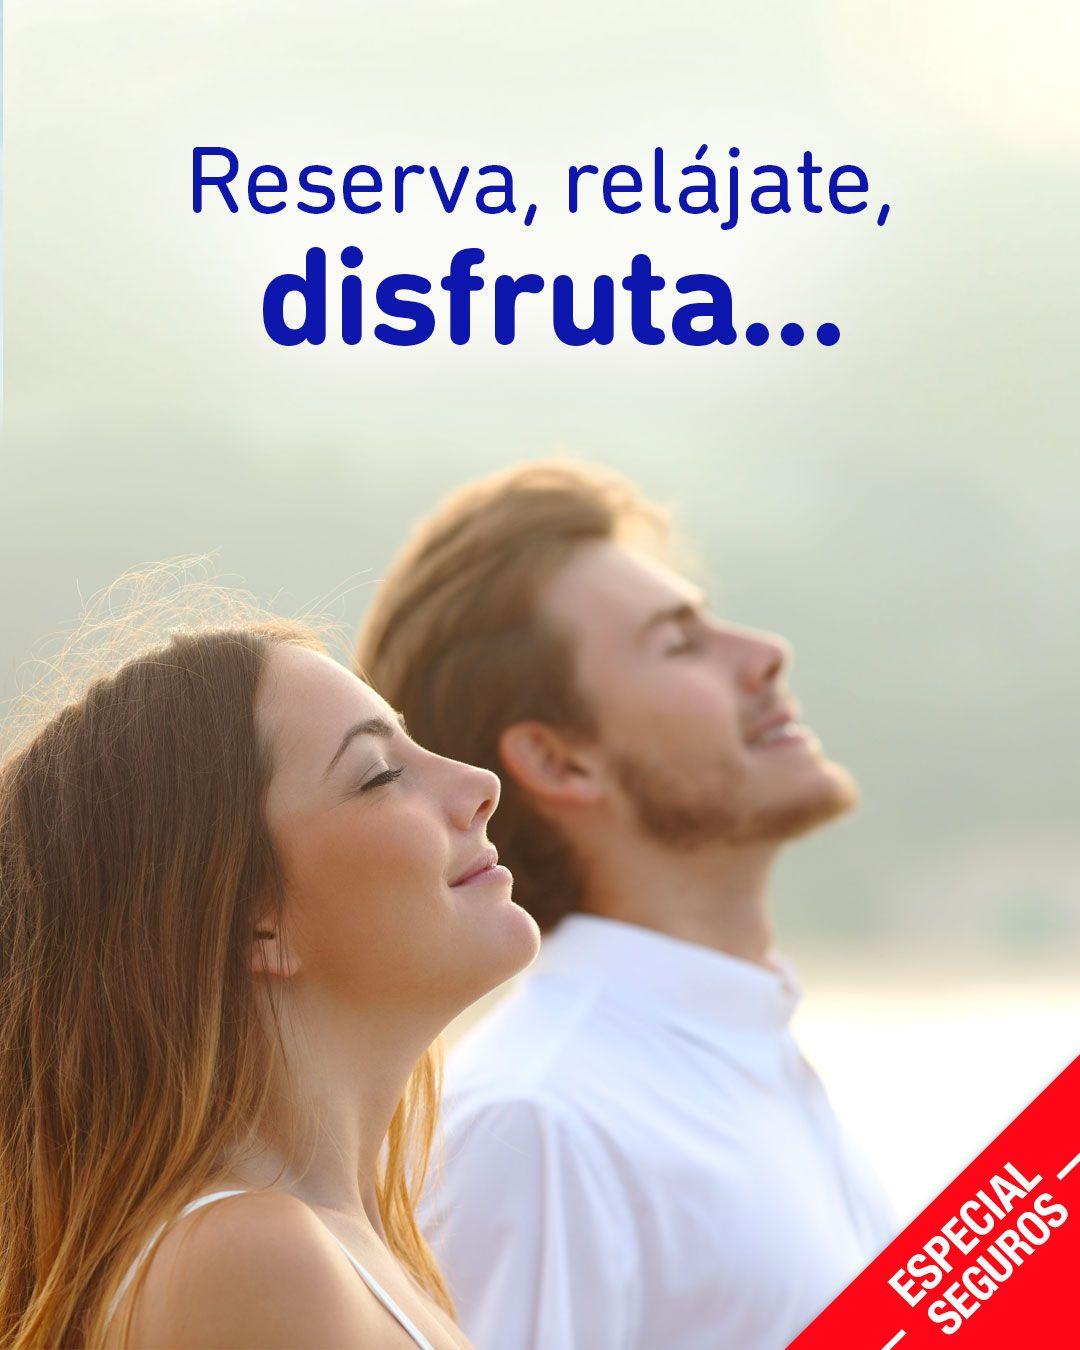 By Centraldereservas.com